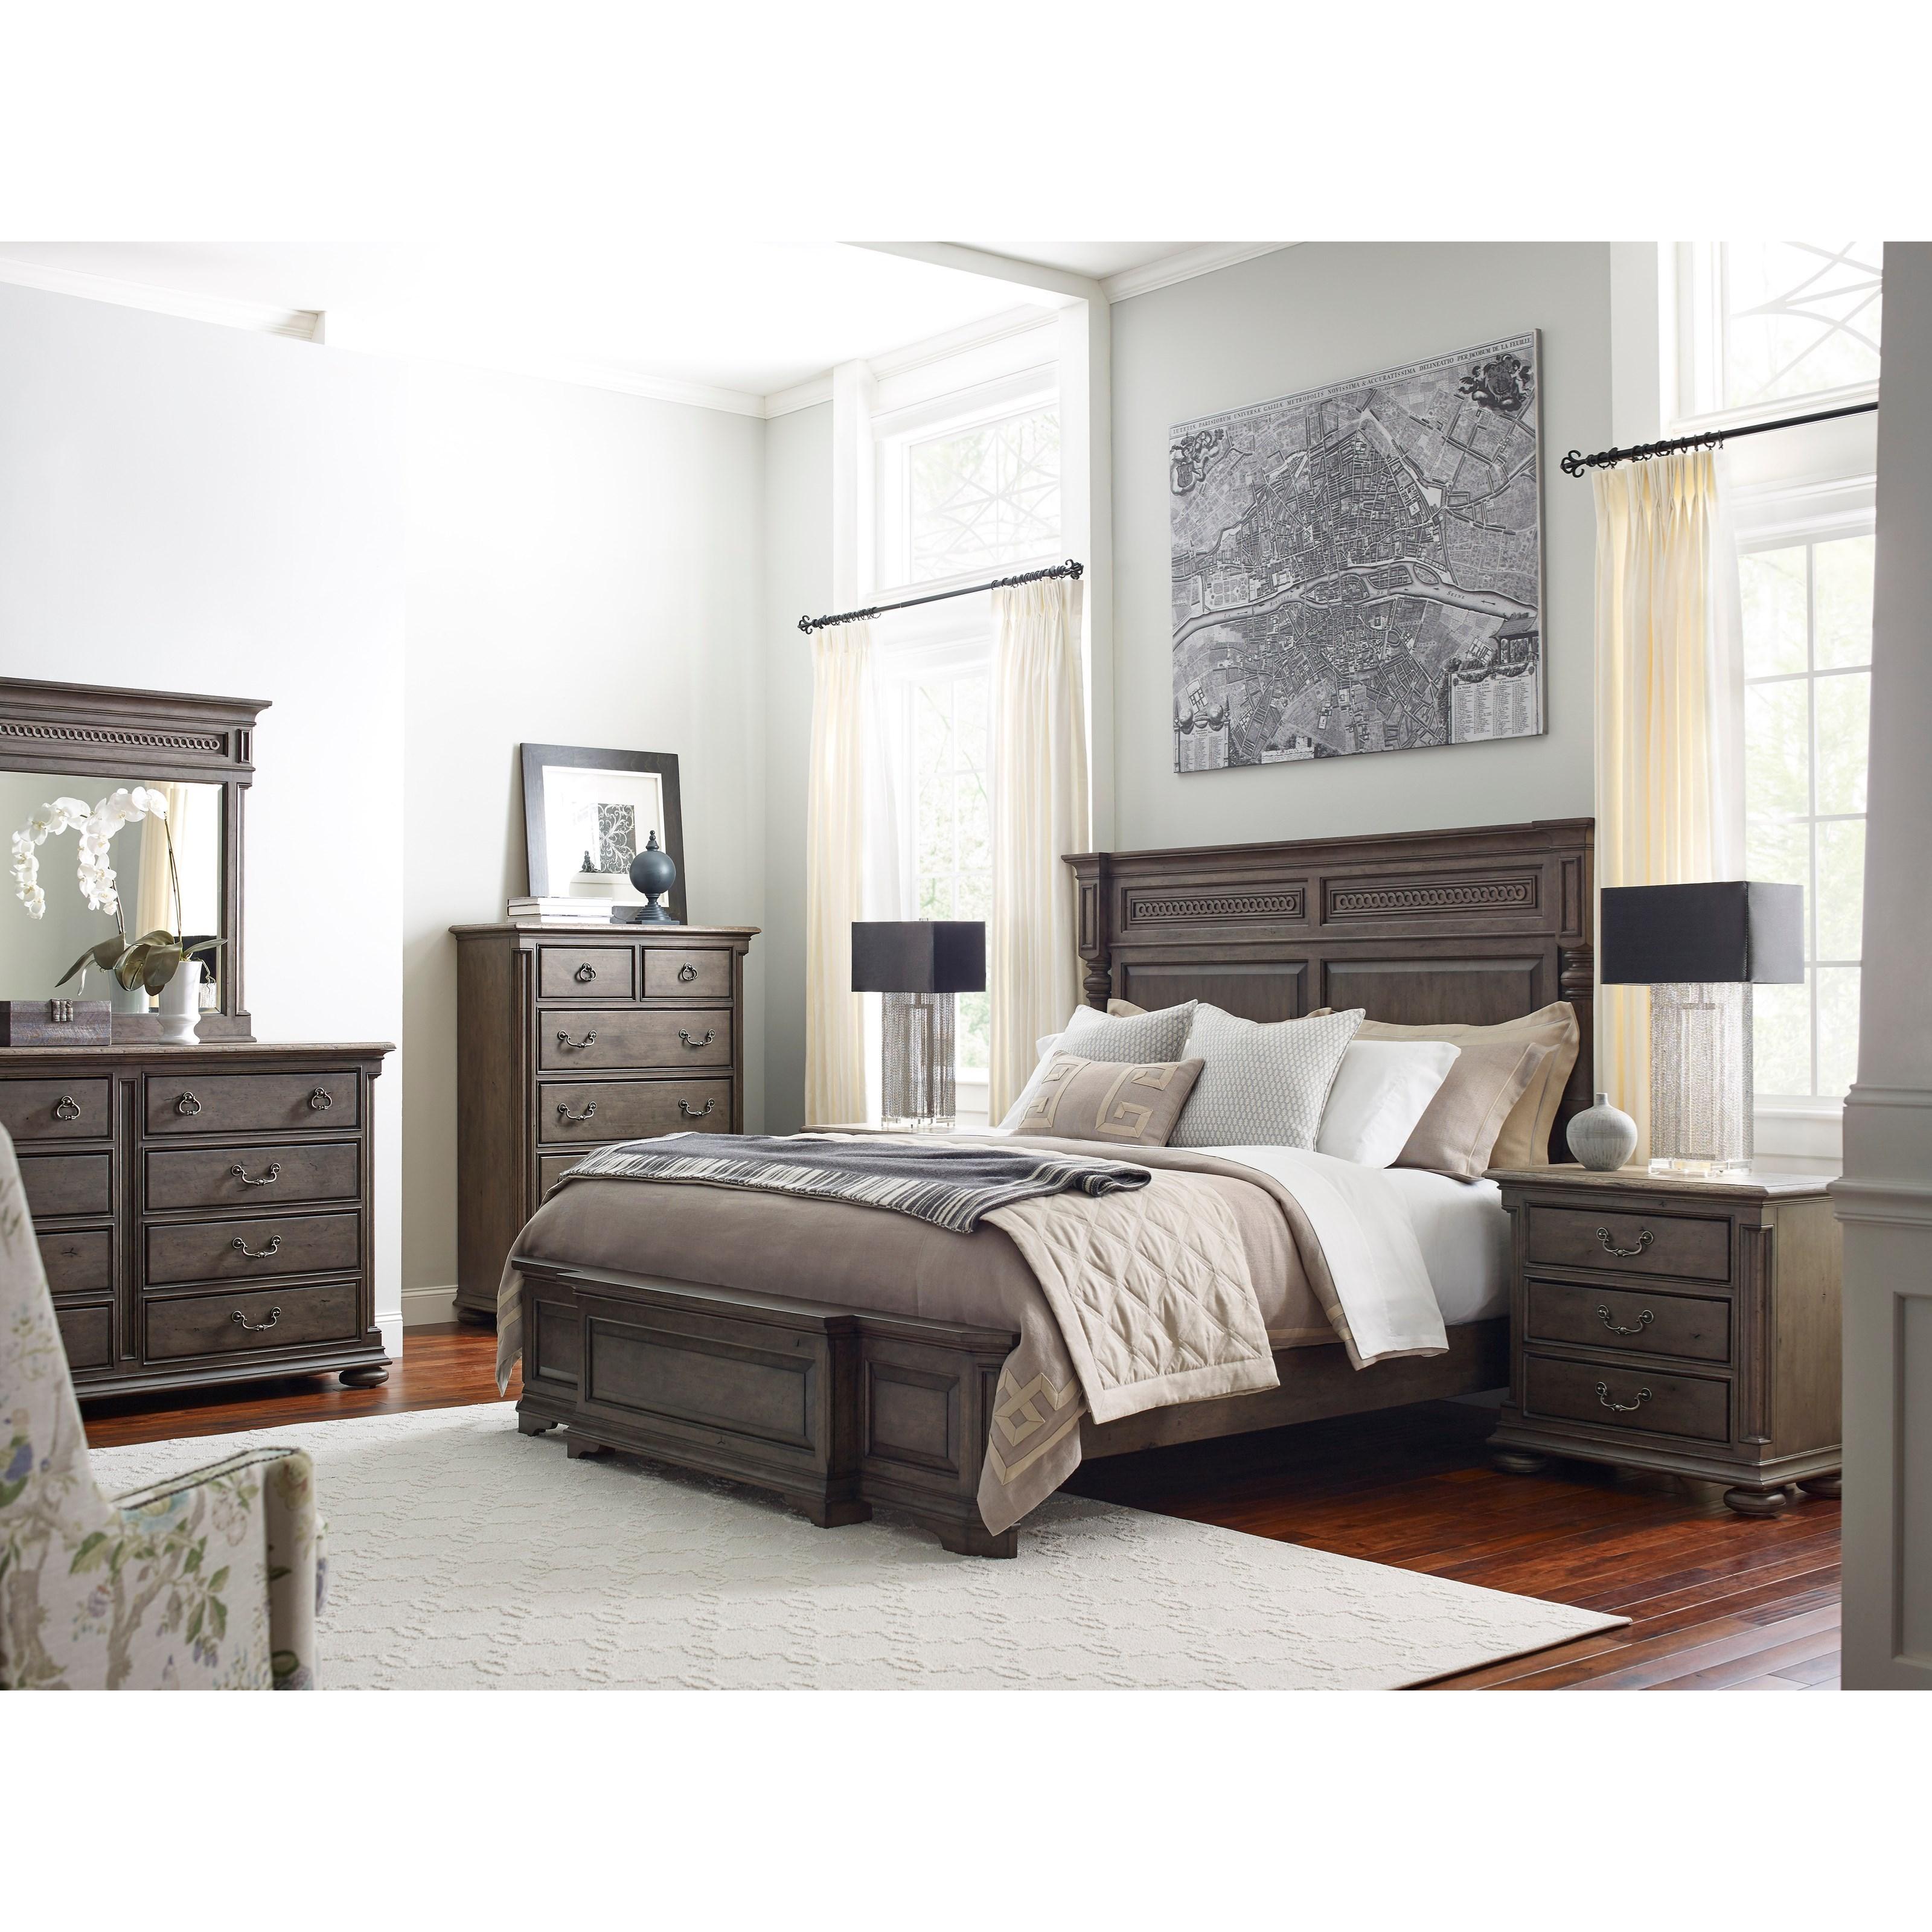 kincaid furniture greyson austin eight drawer dresser johnny janosik dressers. Black Bedroom Furniture Sets. Home Design Ideas